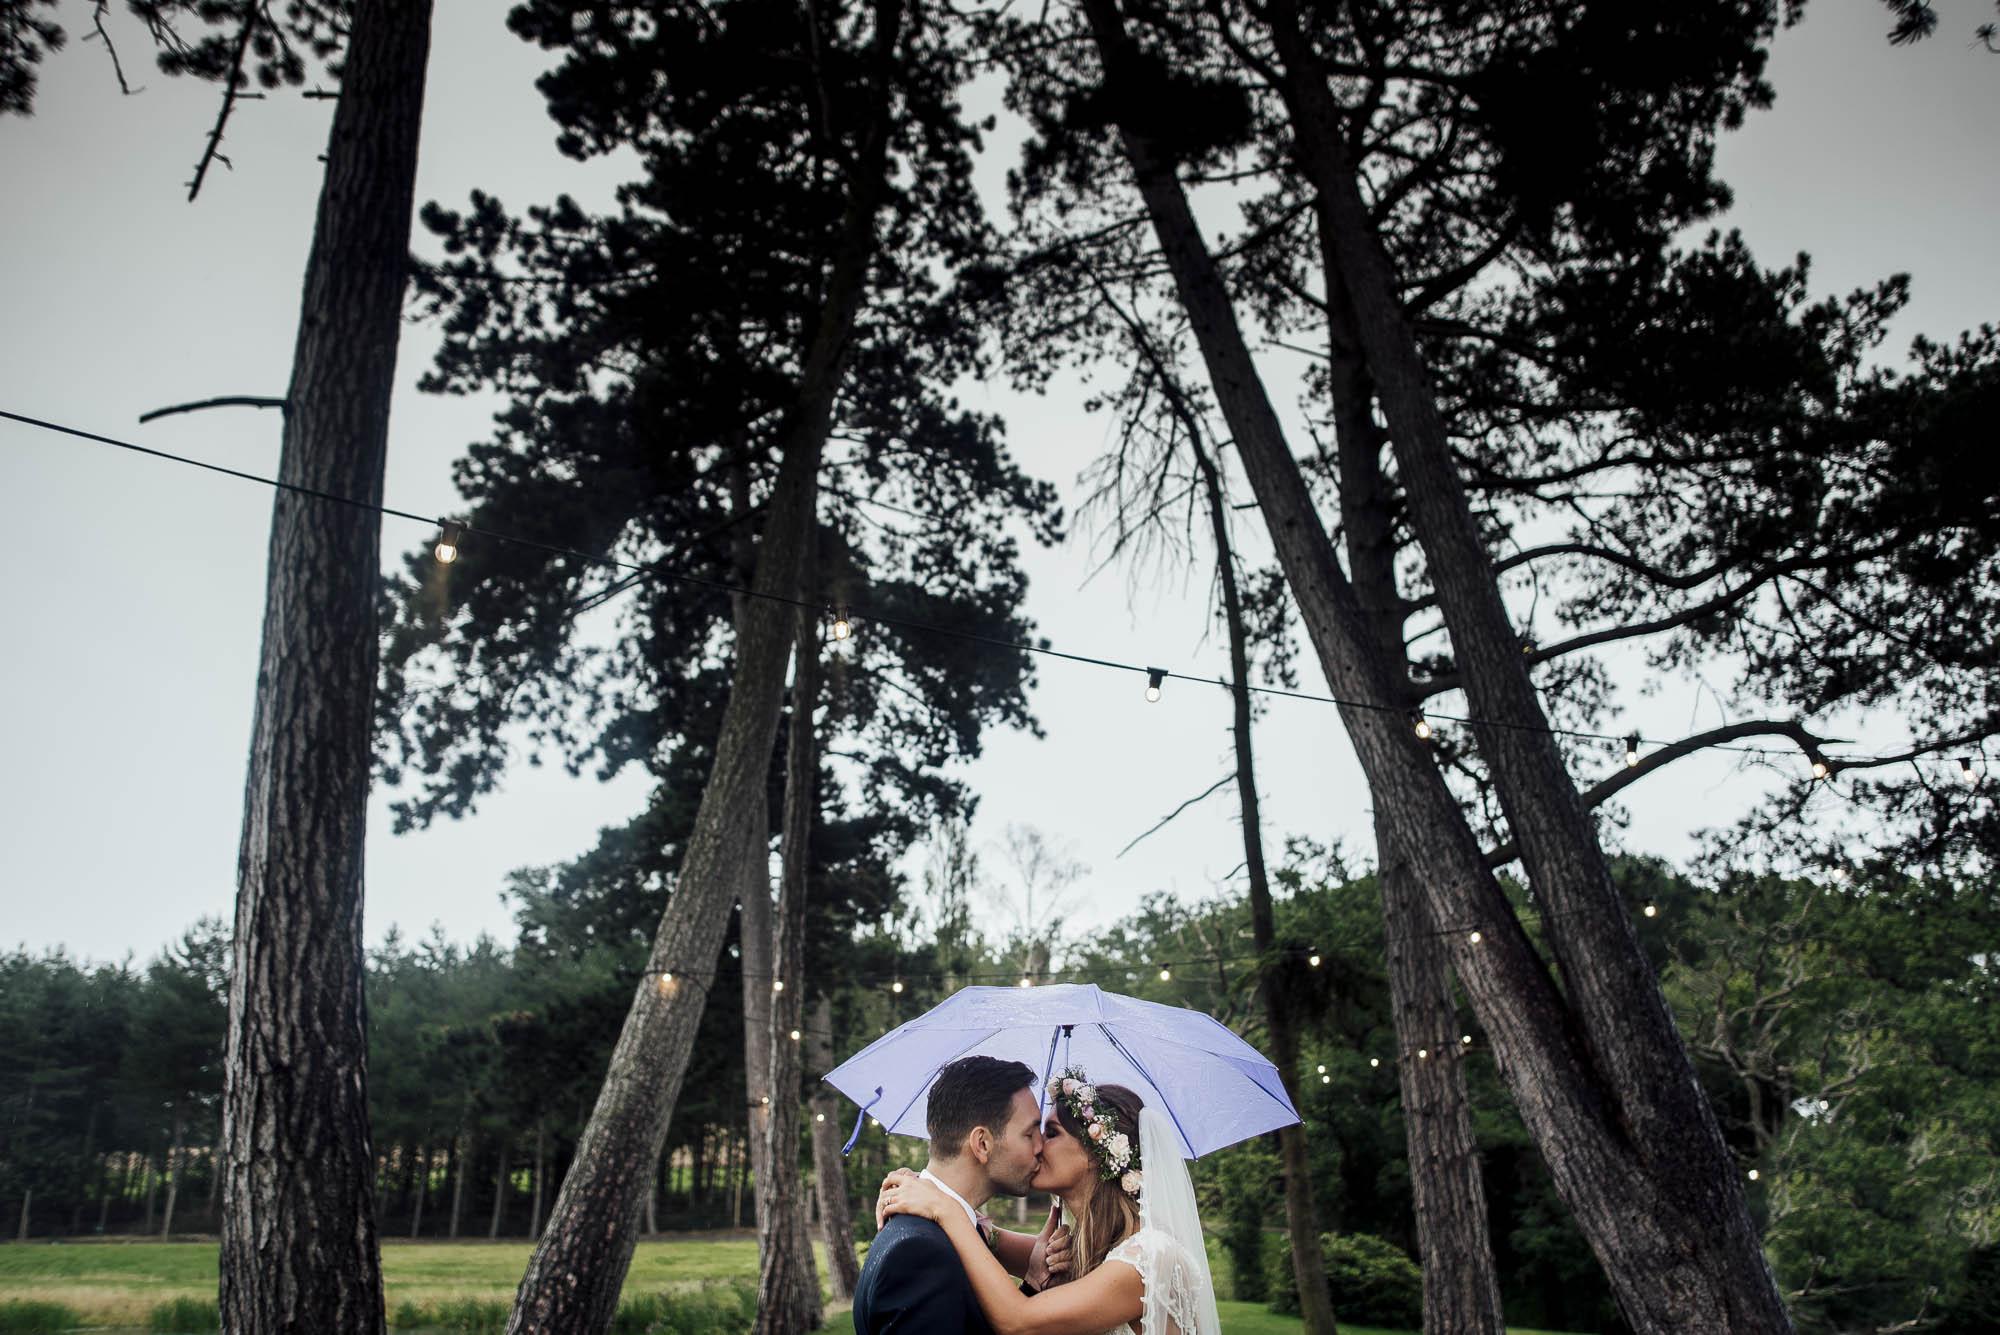 Bride & Groom under an umbrella on a rainy wedding day